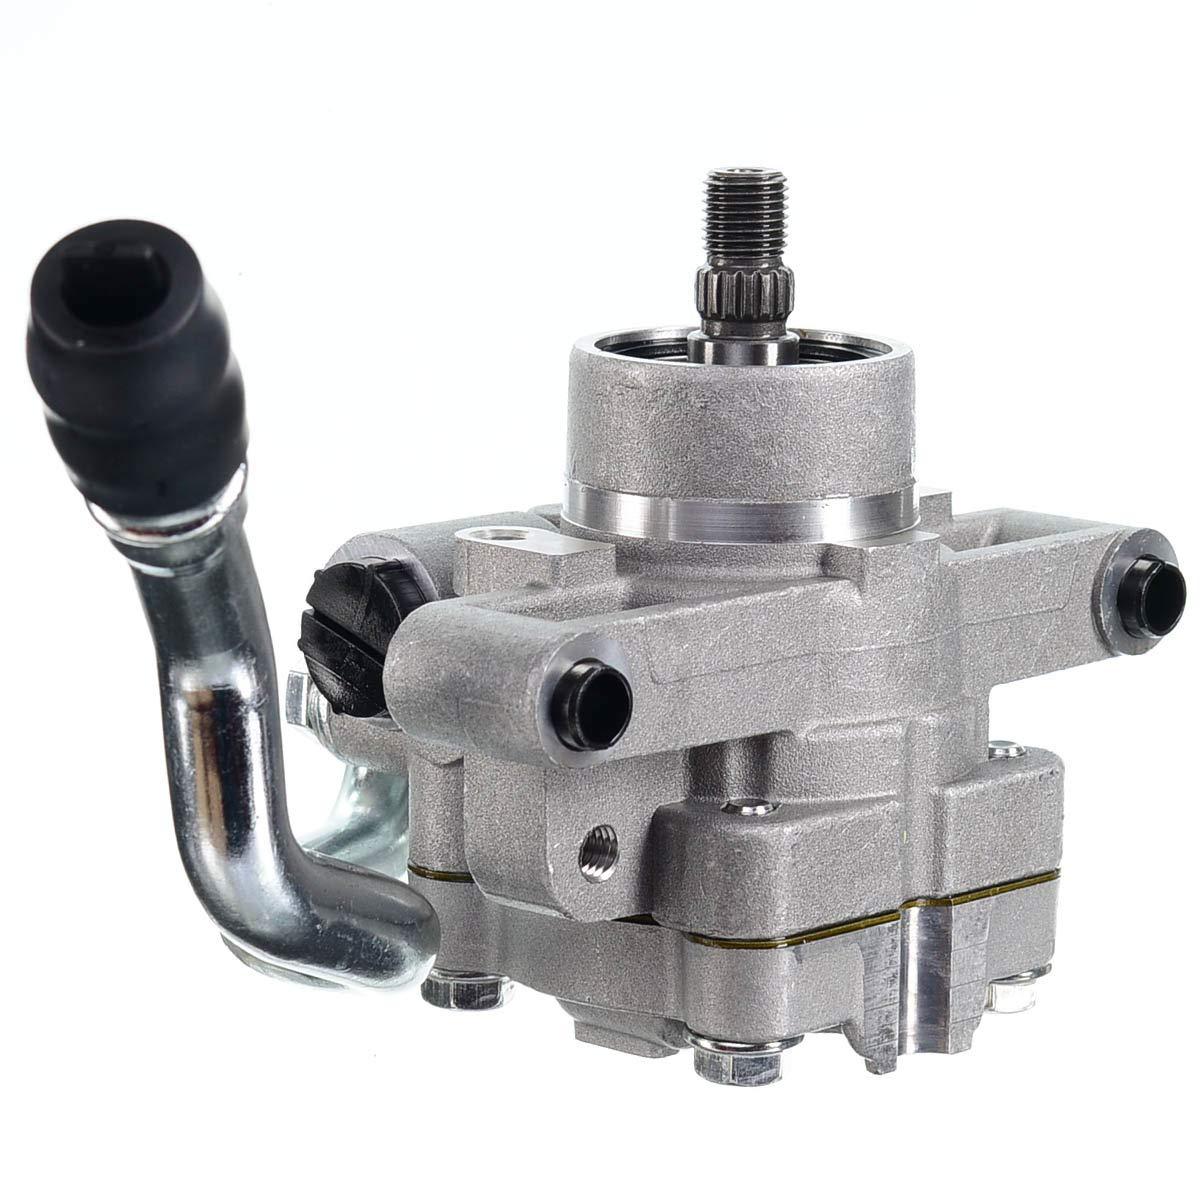 A-Premium Power Steering Pump for Ford Escape 2004-2007 Mazda Tribute Mercury Mariner